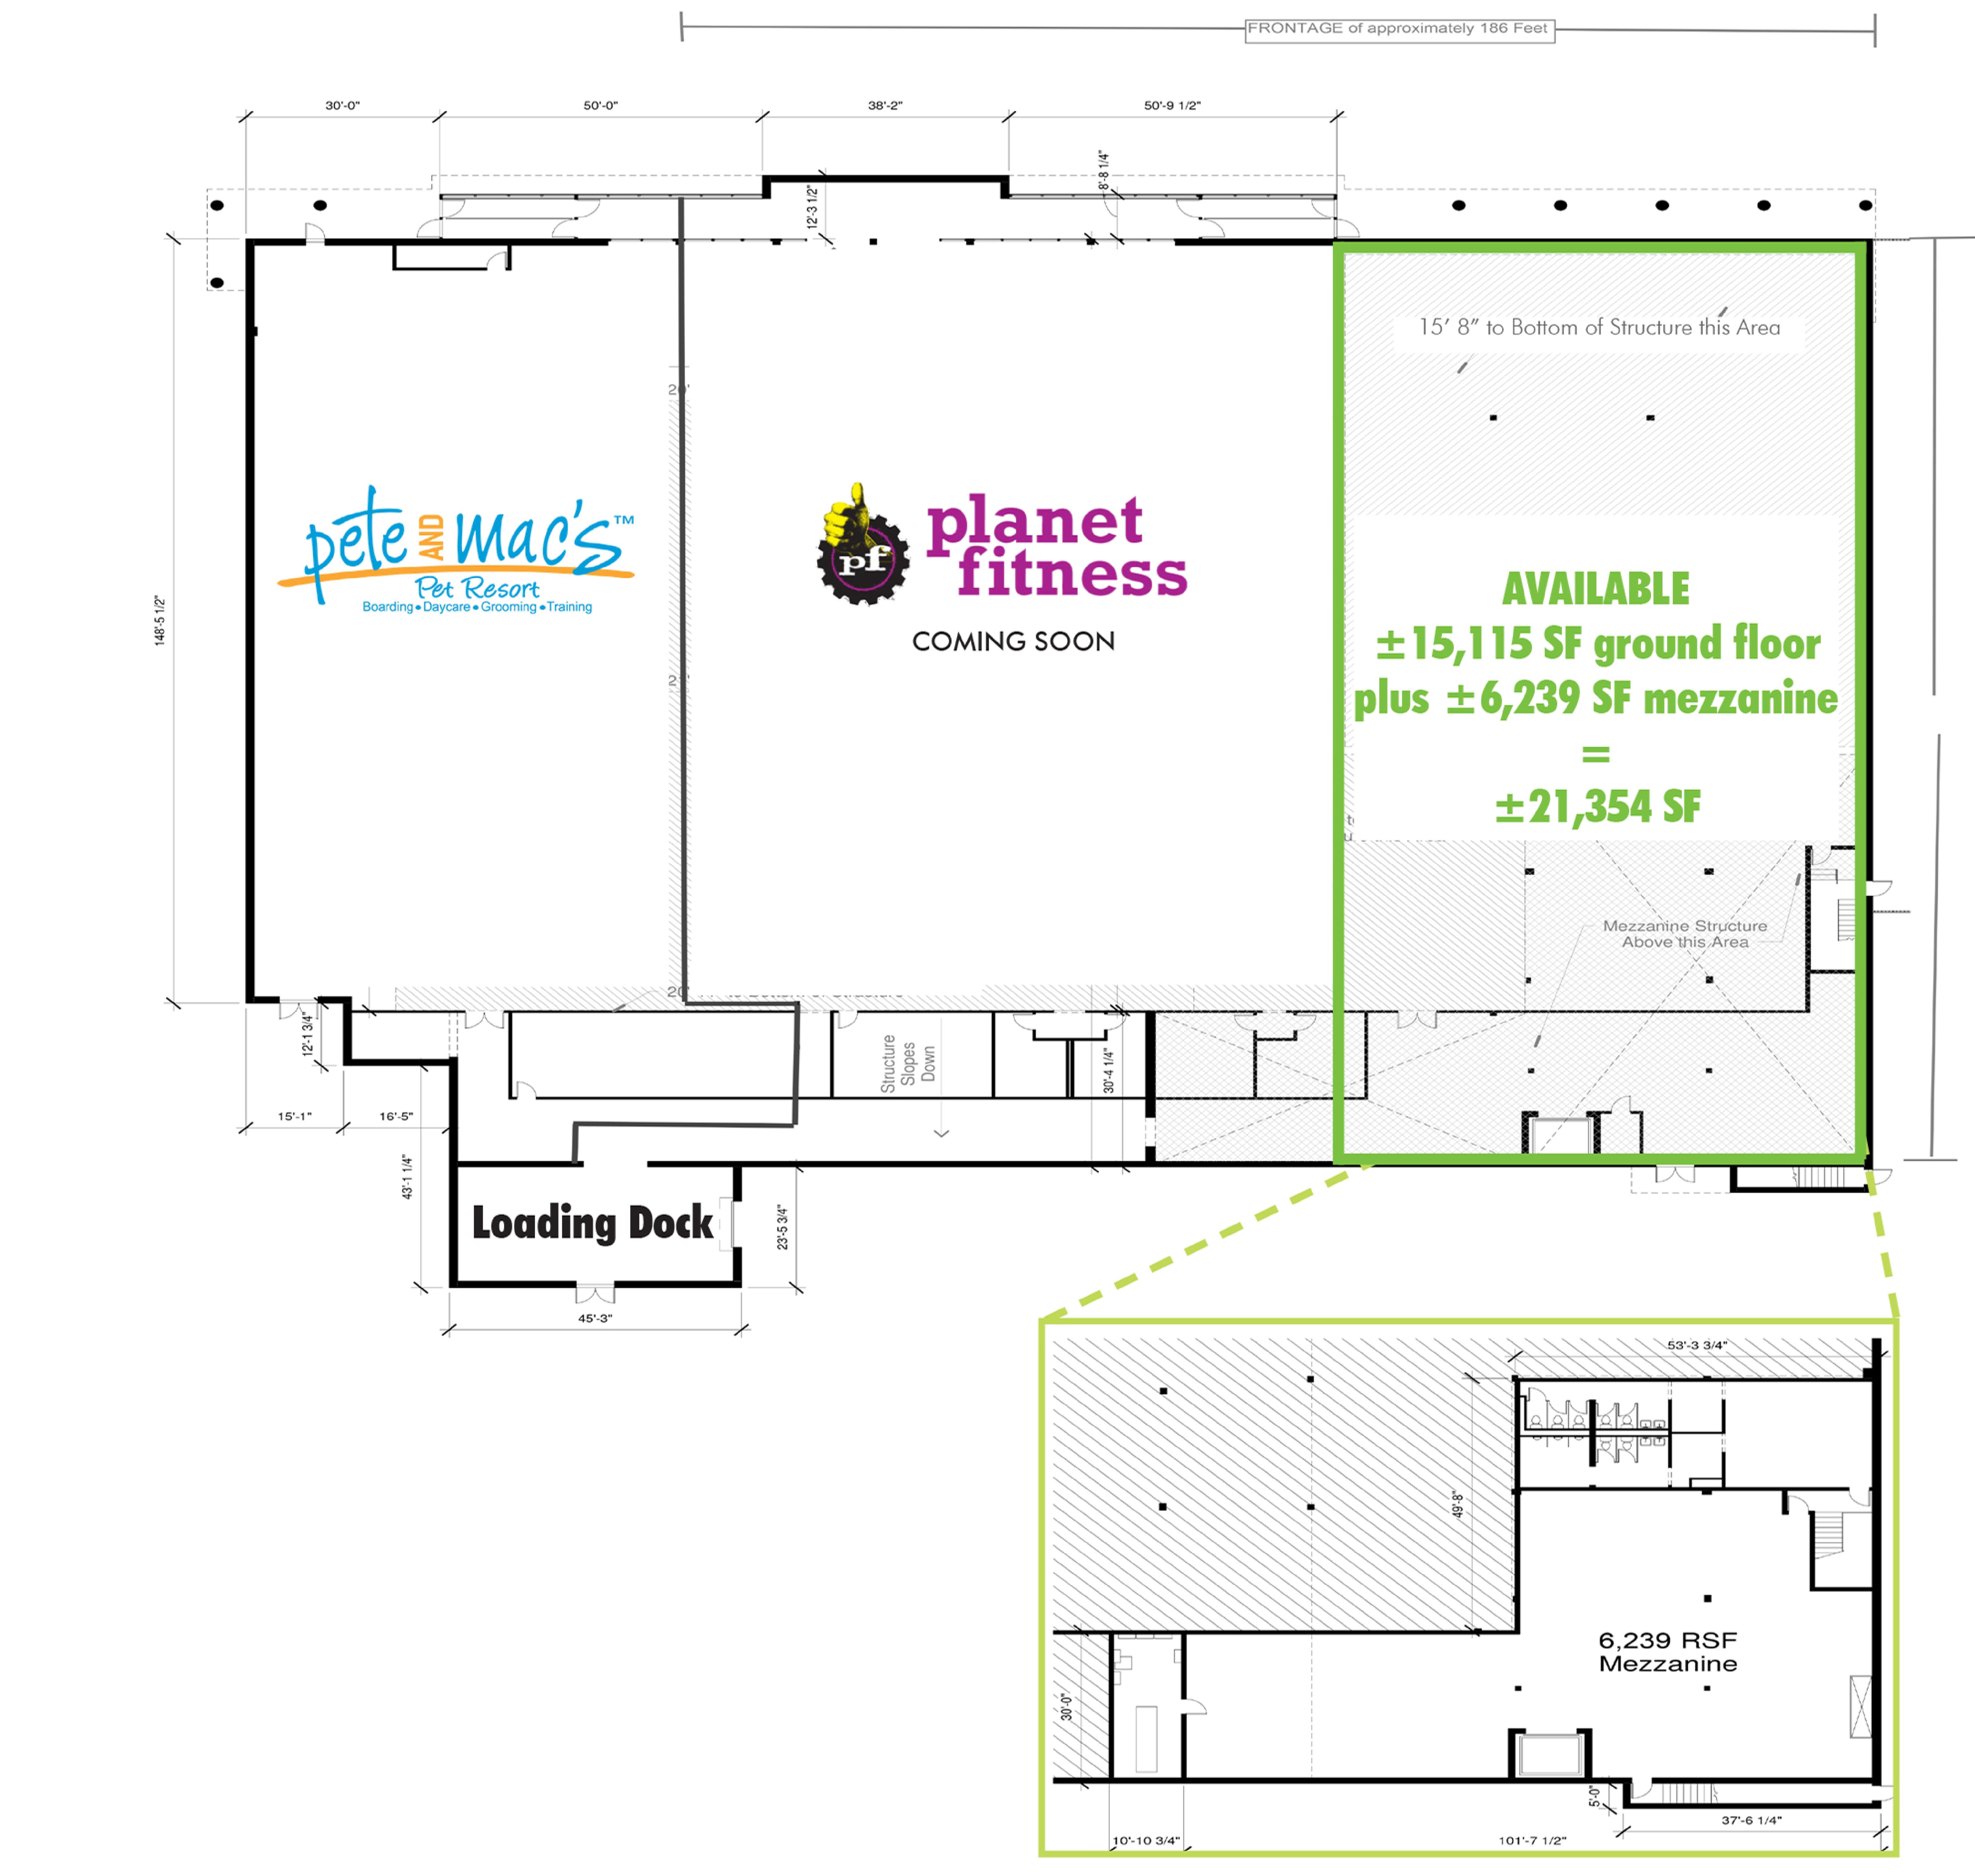 Palatine Plaza: site plan